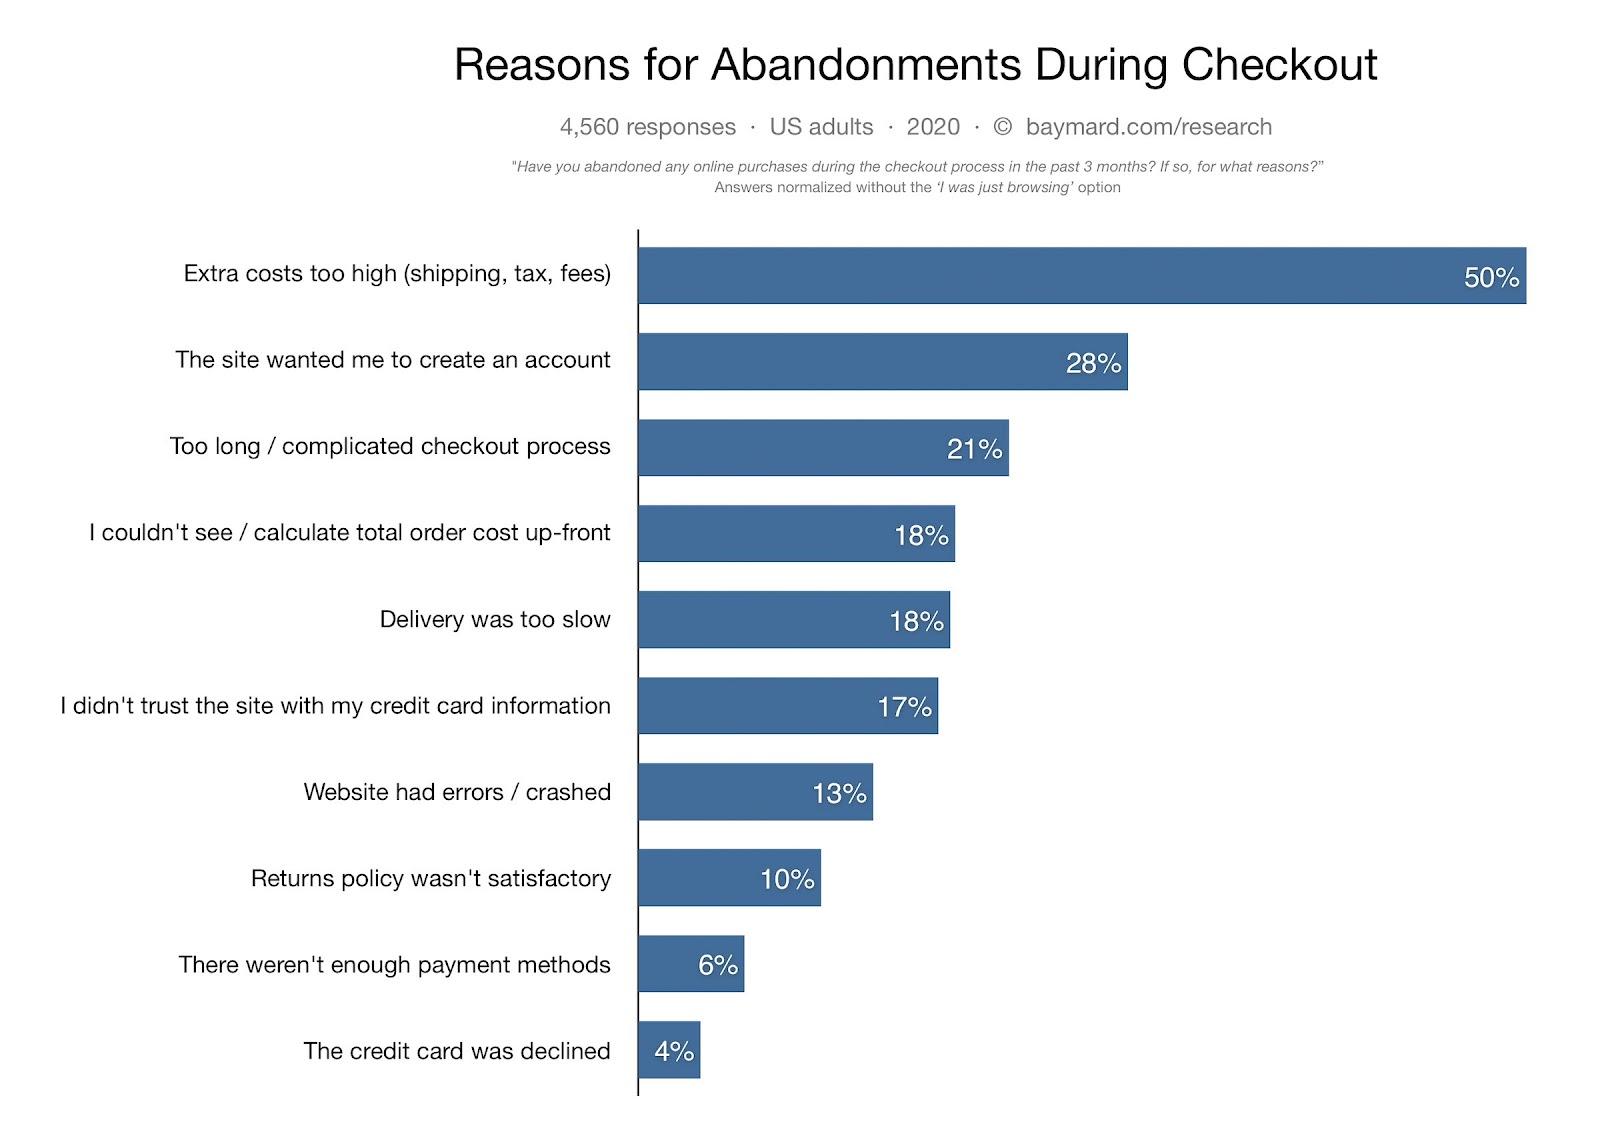 Reasons for cart abandonments